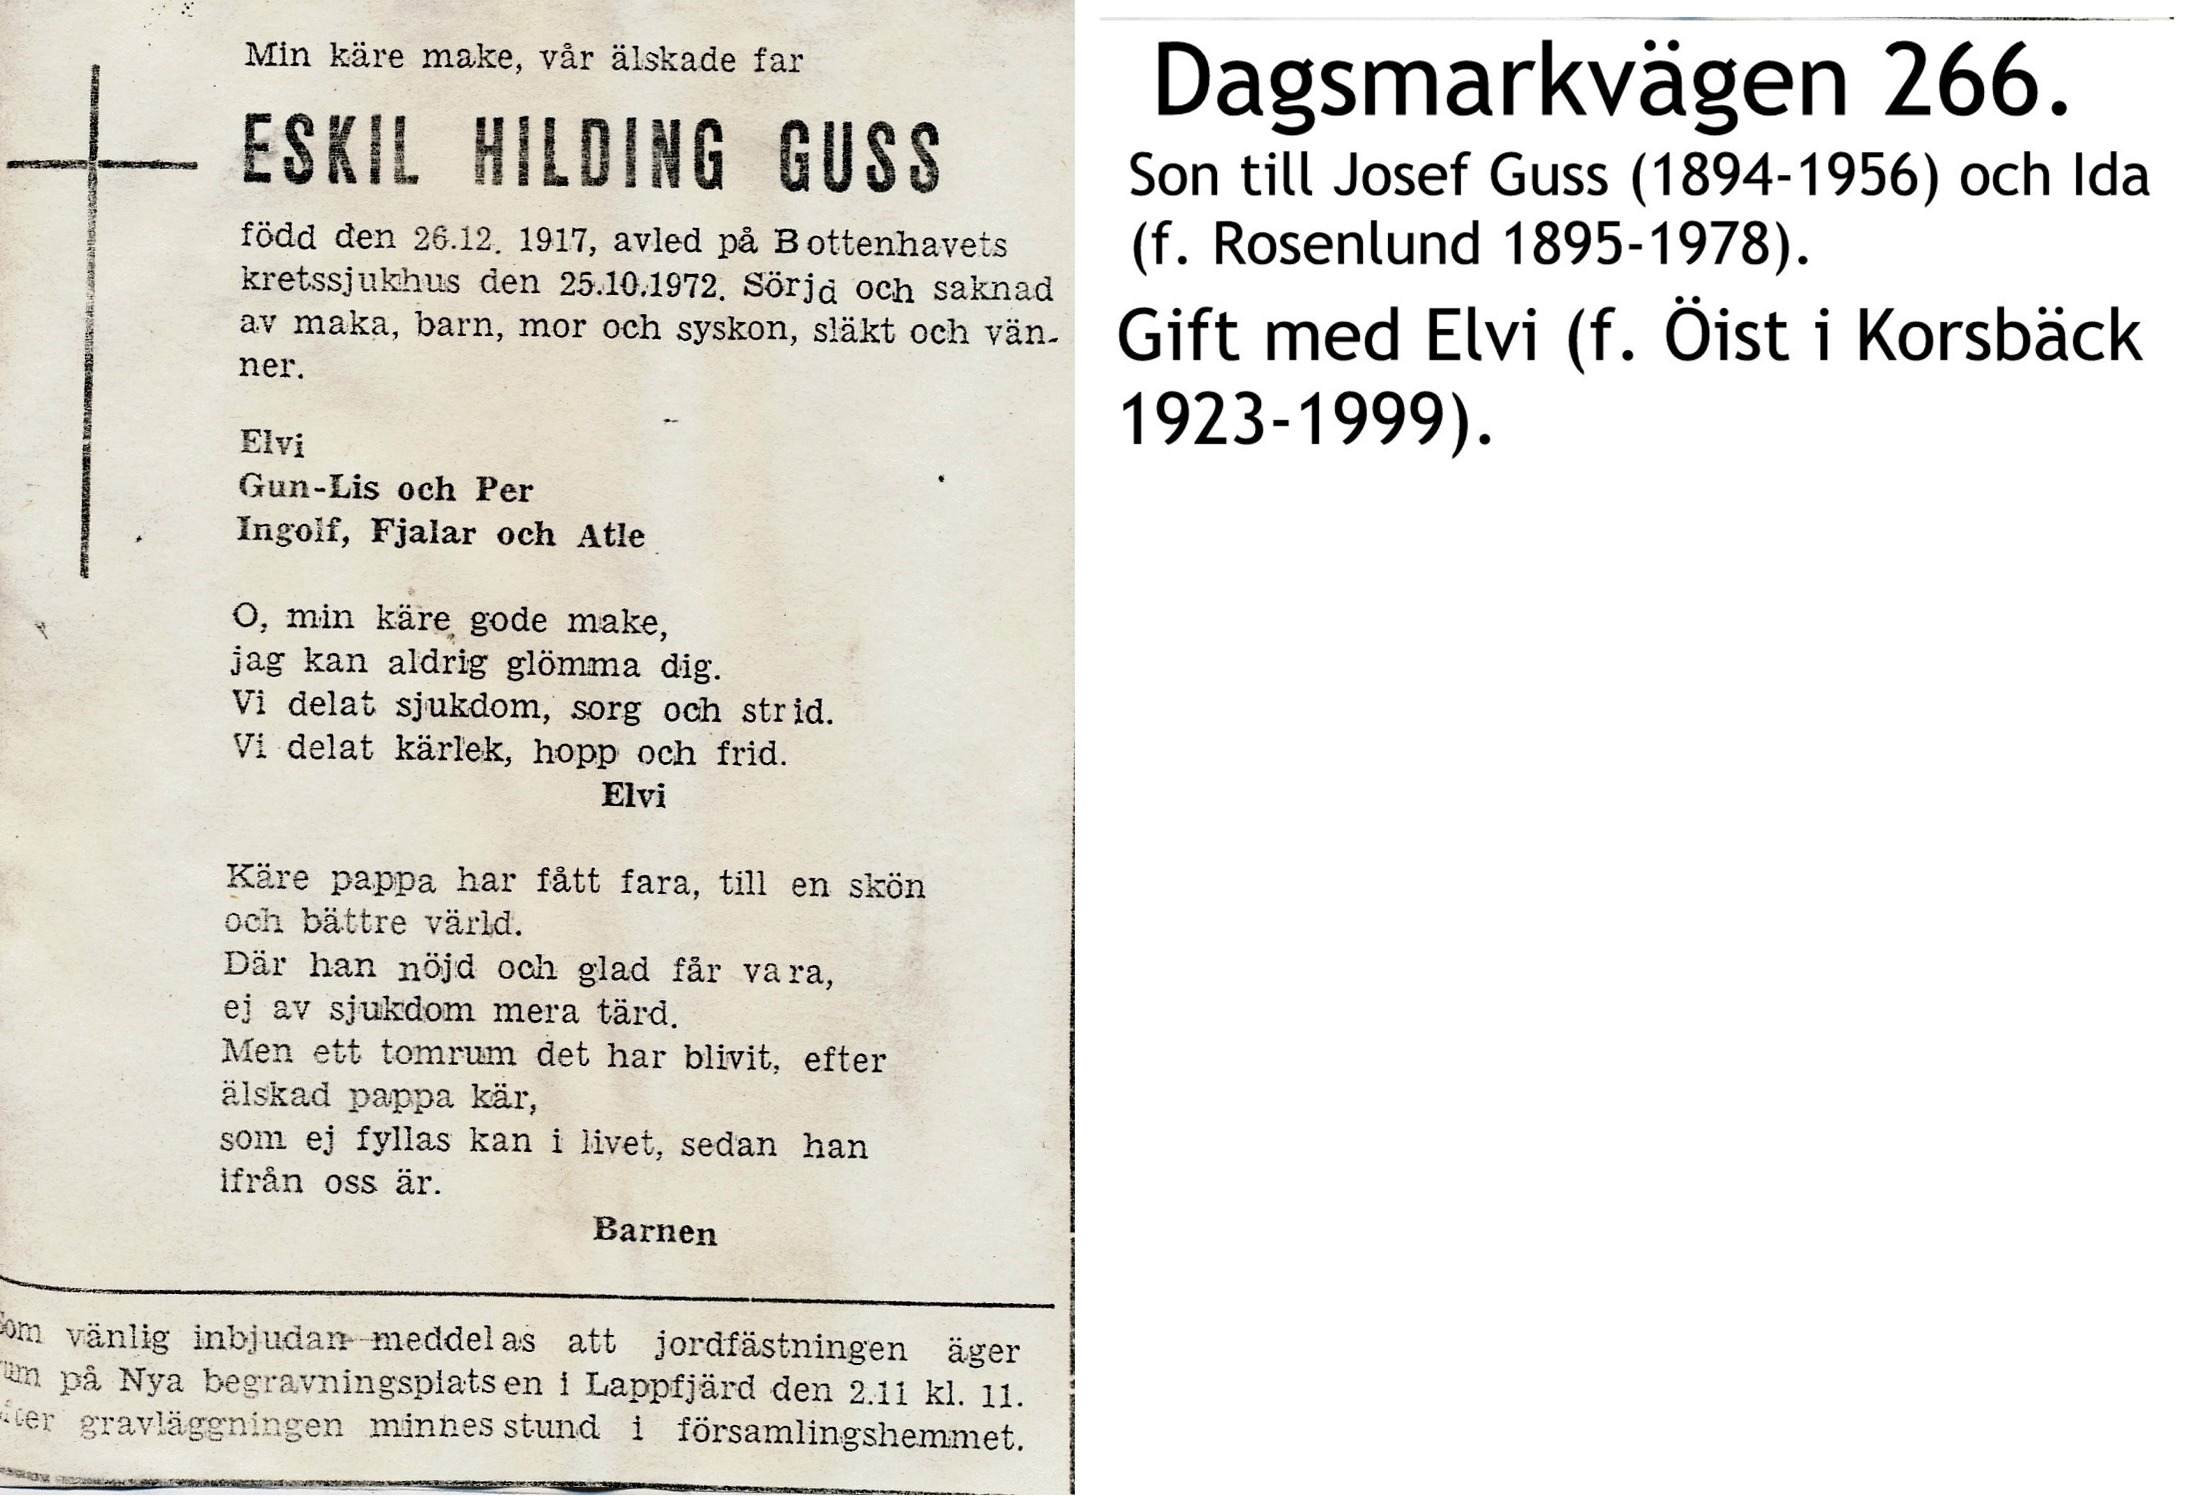 Guss Eskil